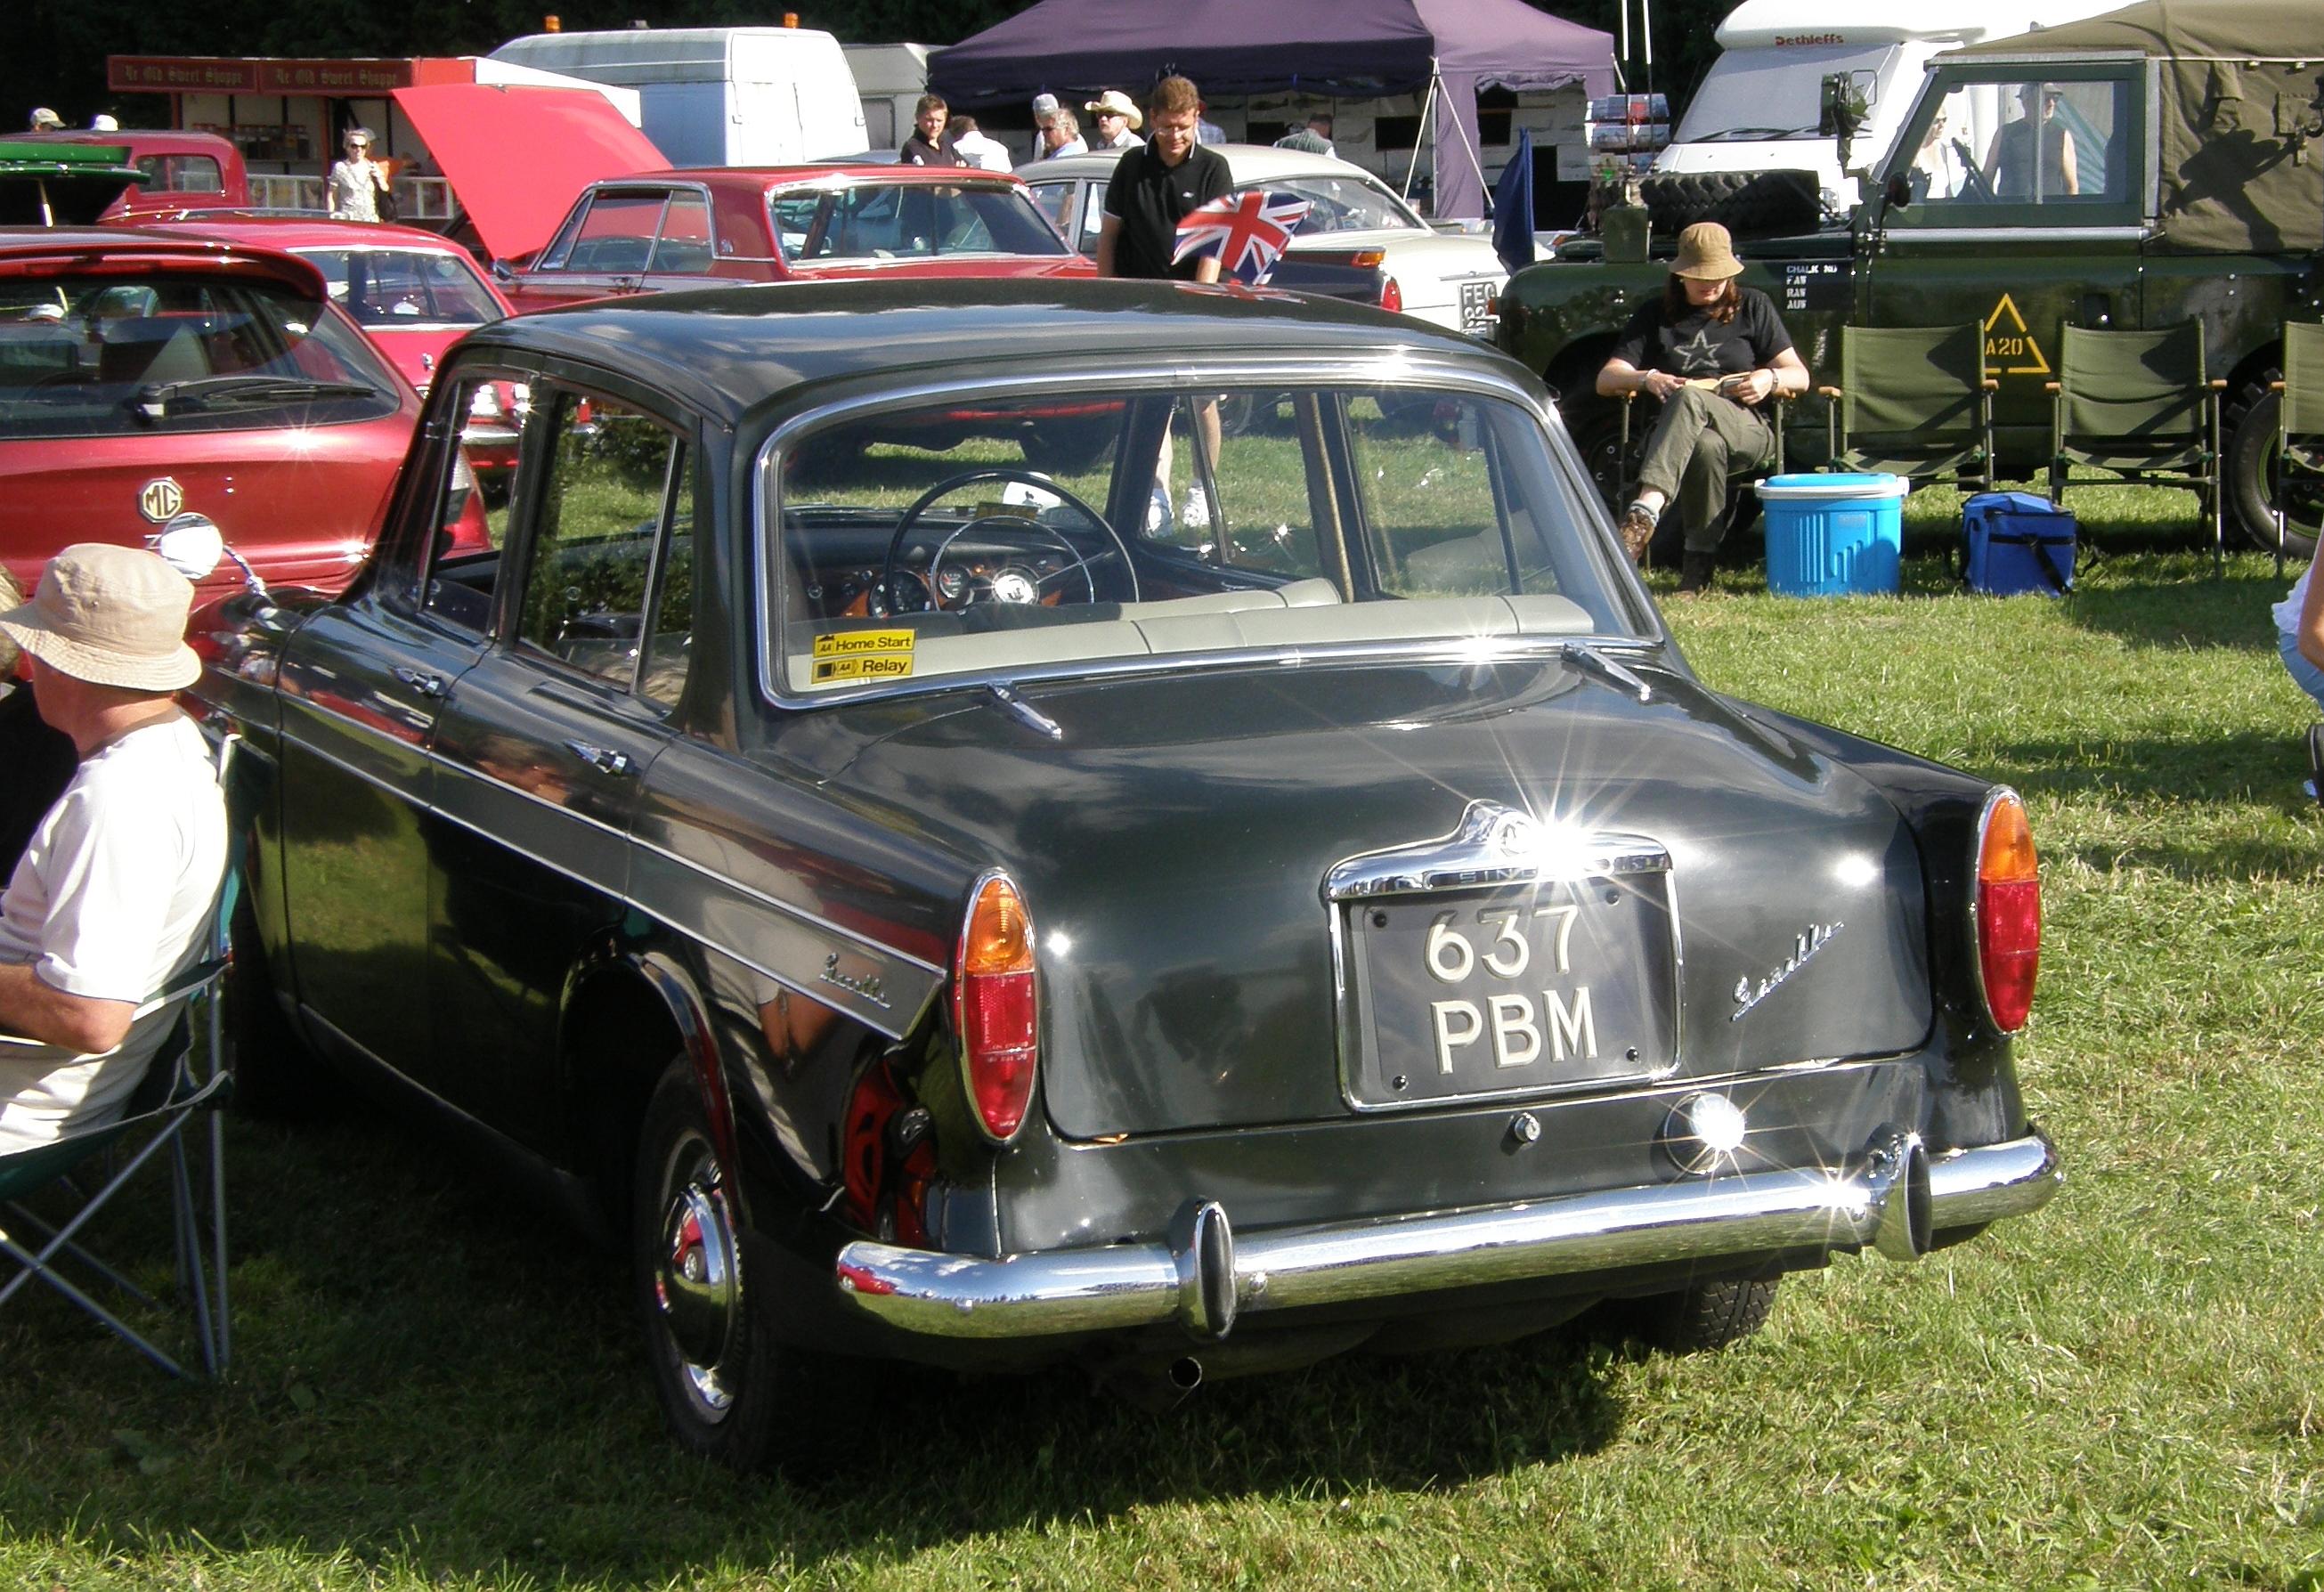 File:singer Gazelle v of 1964